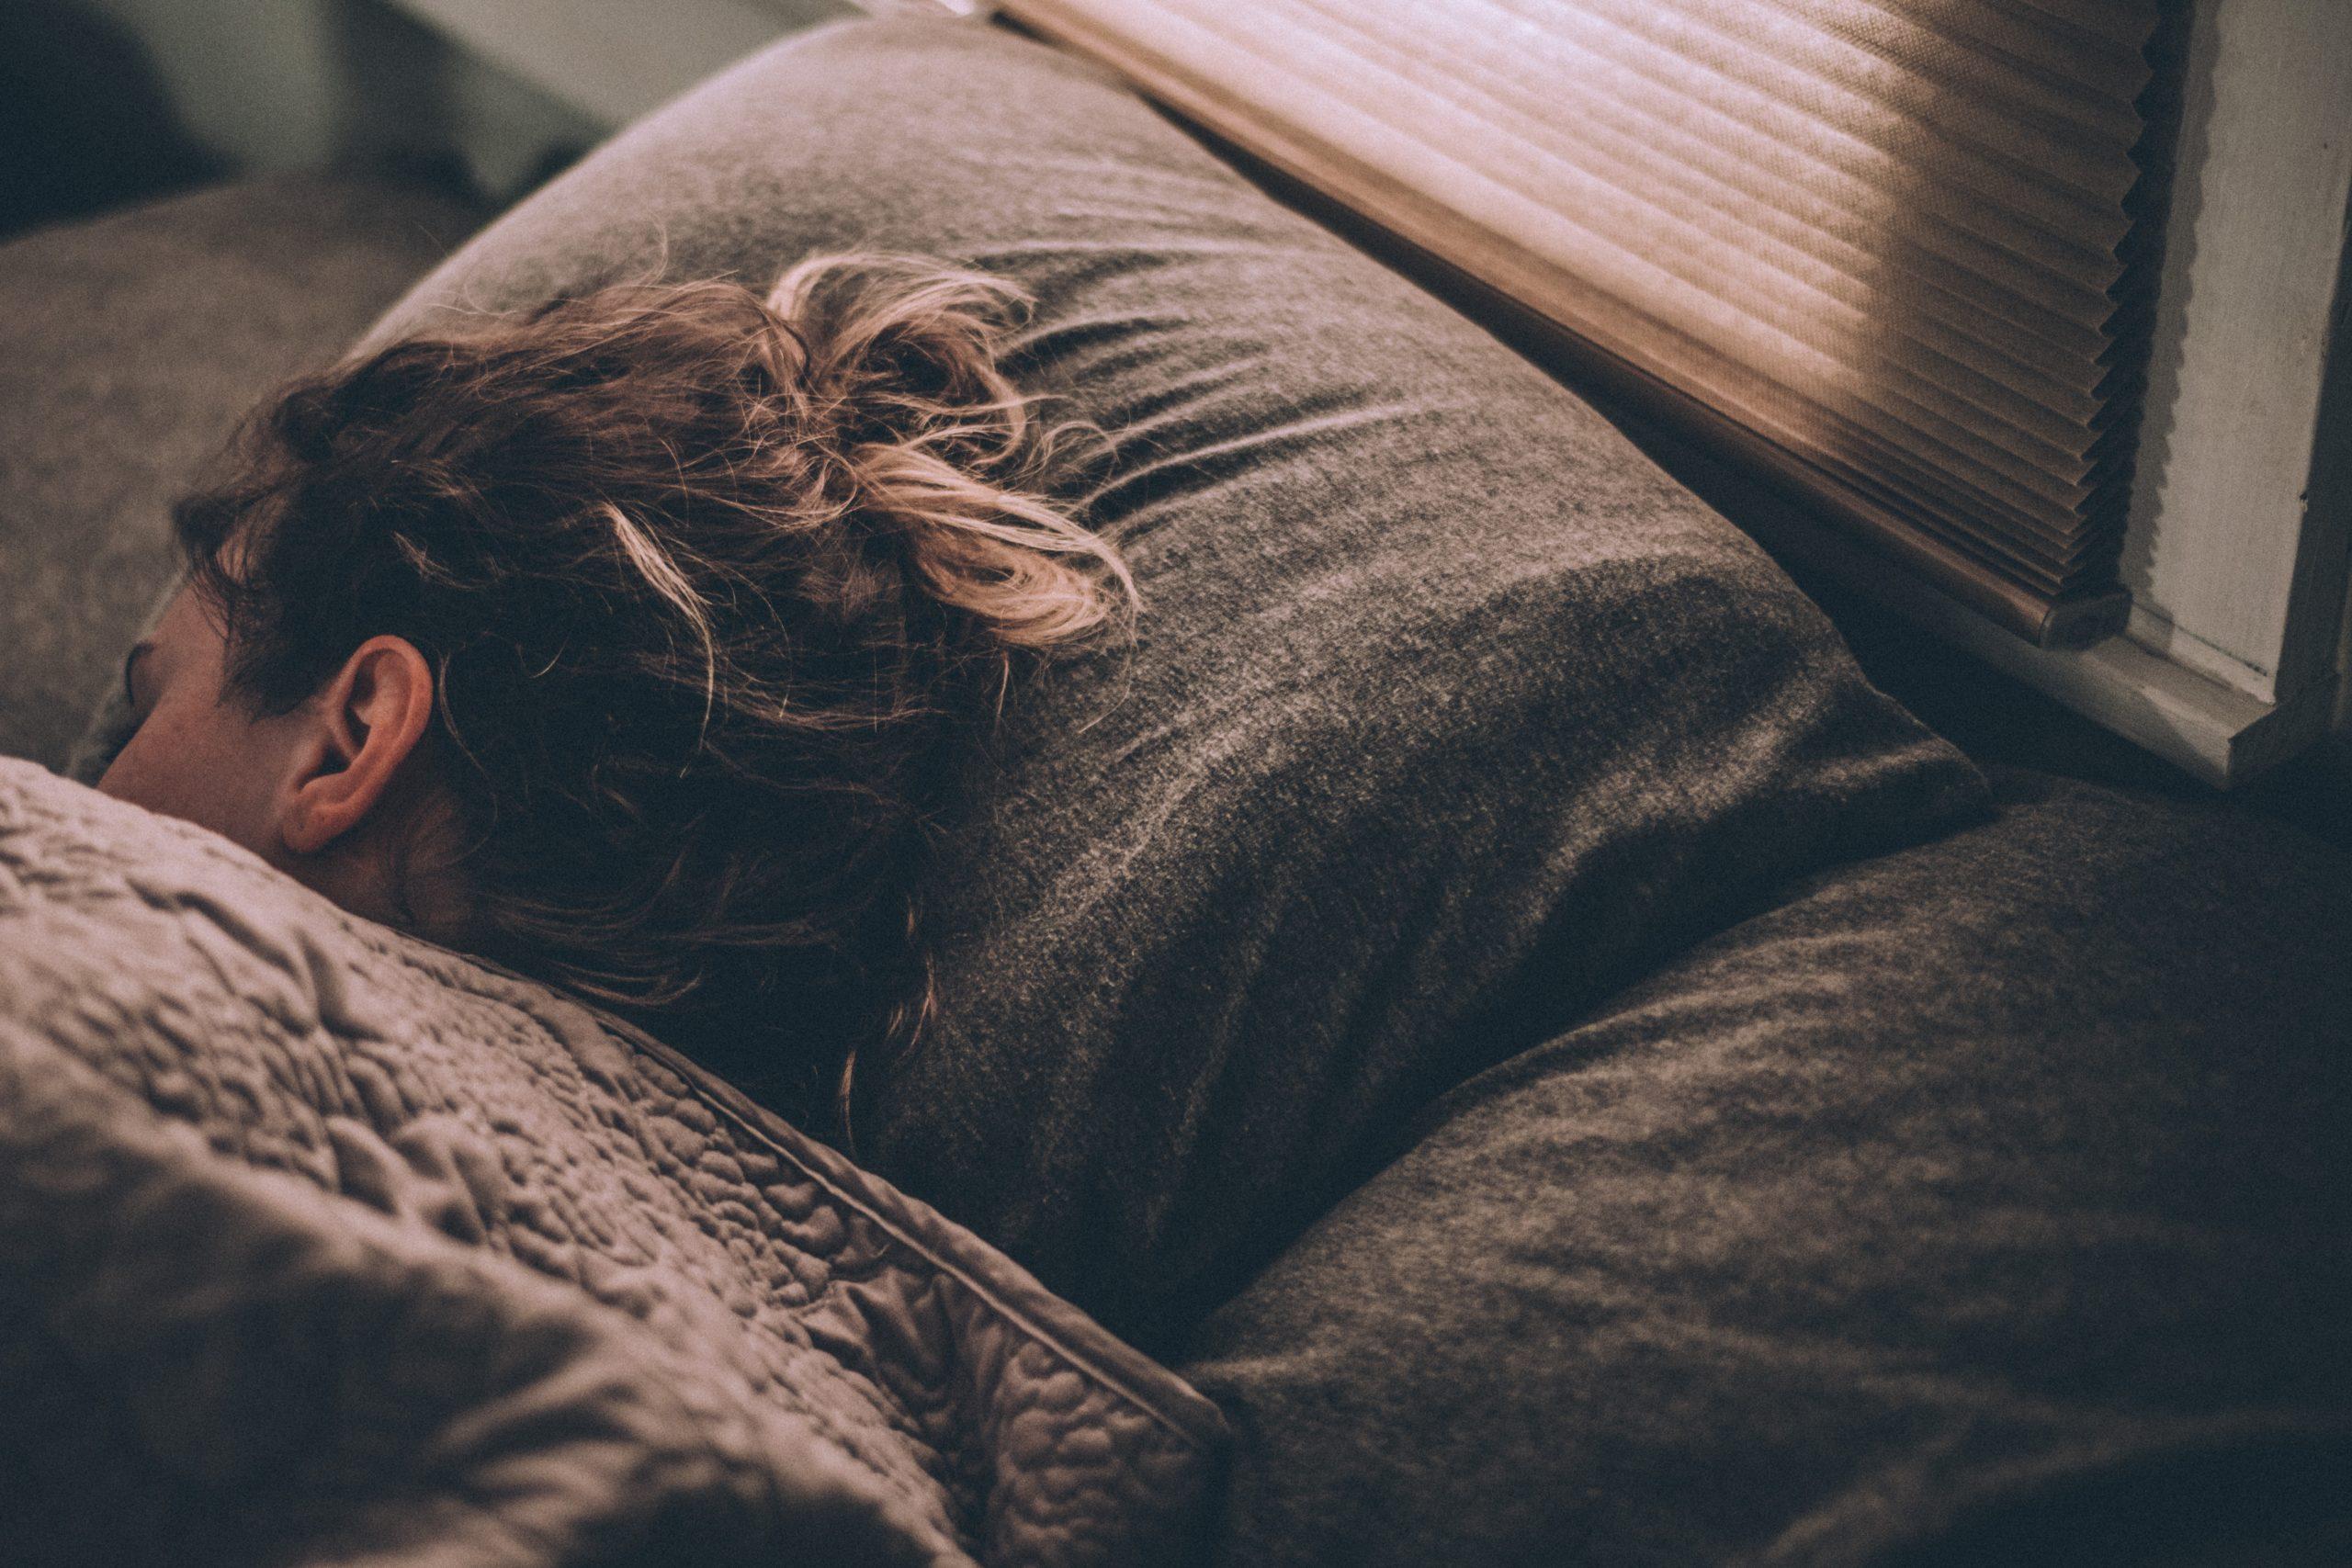 Woman sleeping on grey pillow